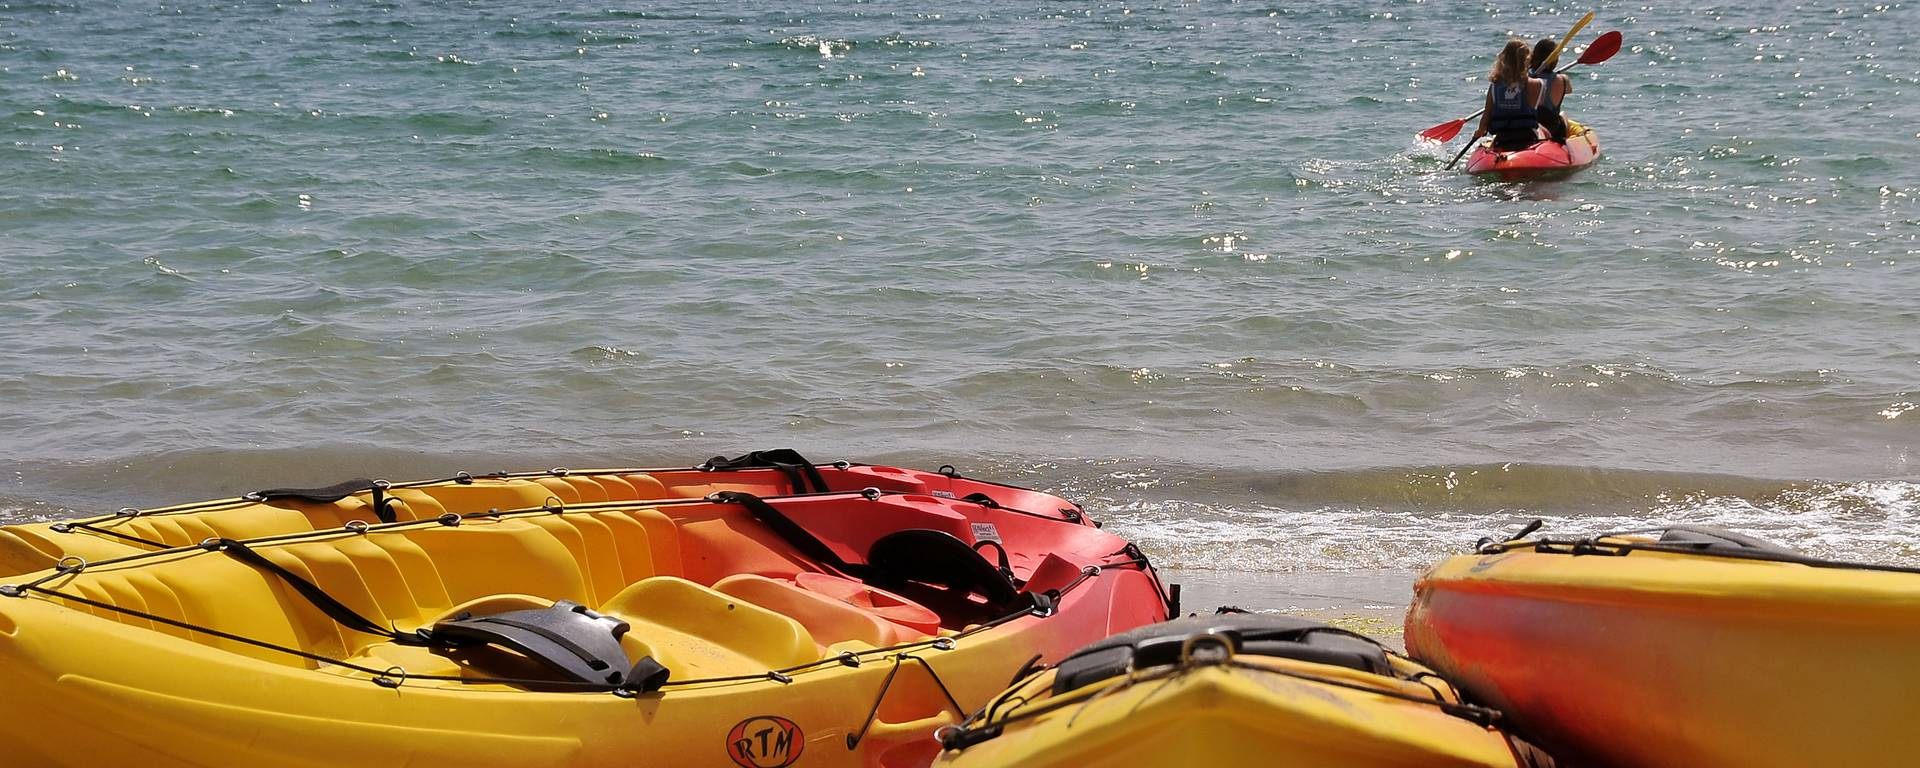 Flotte de kayaks